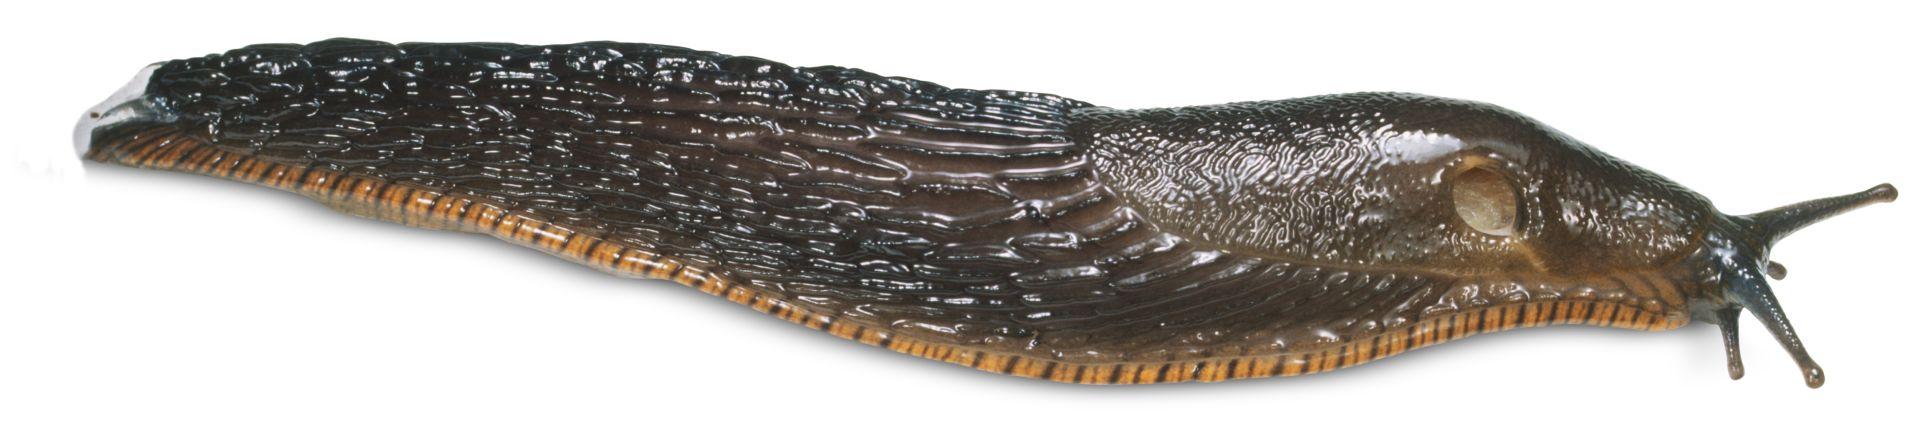 Sea Slug Facts For Kids